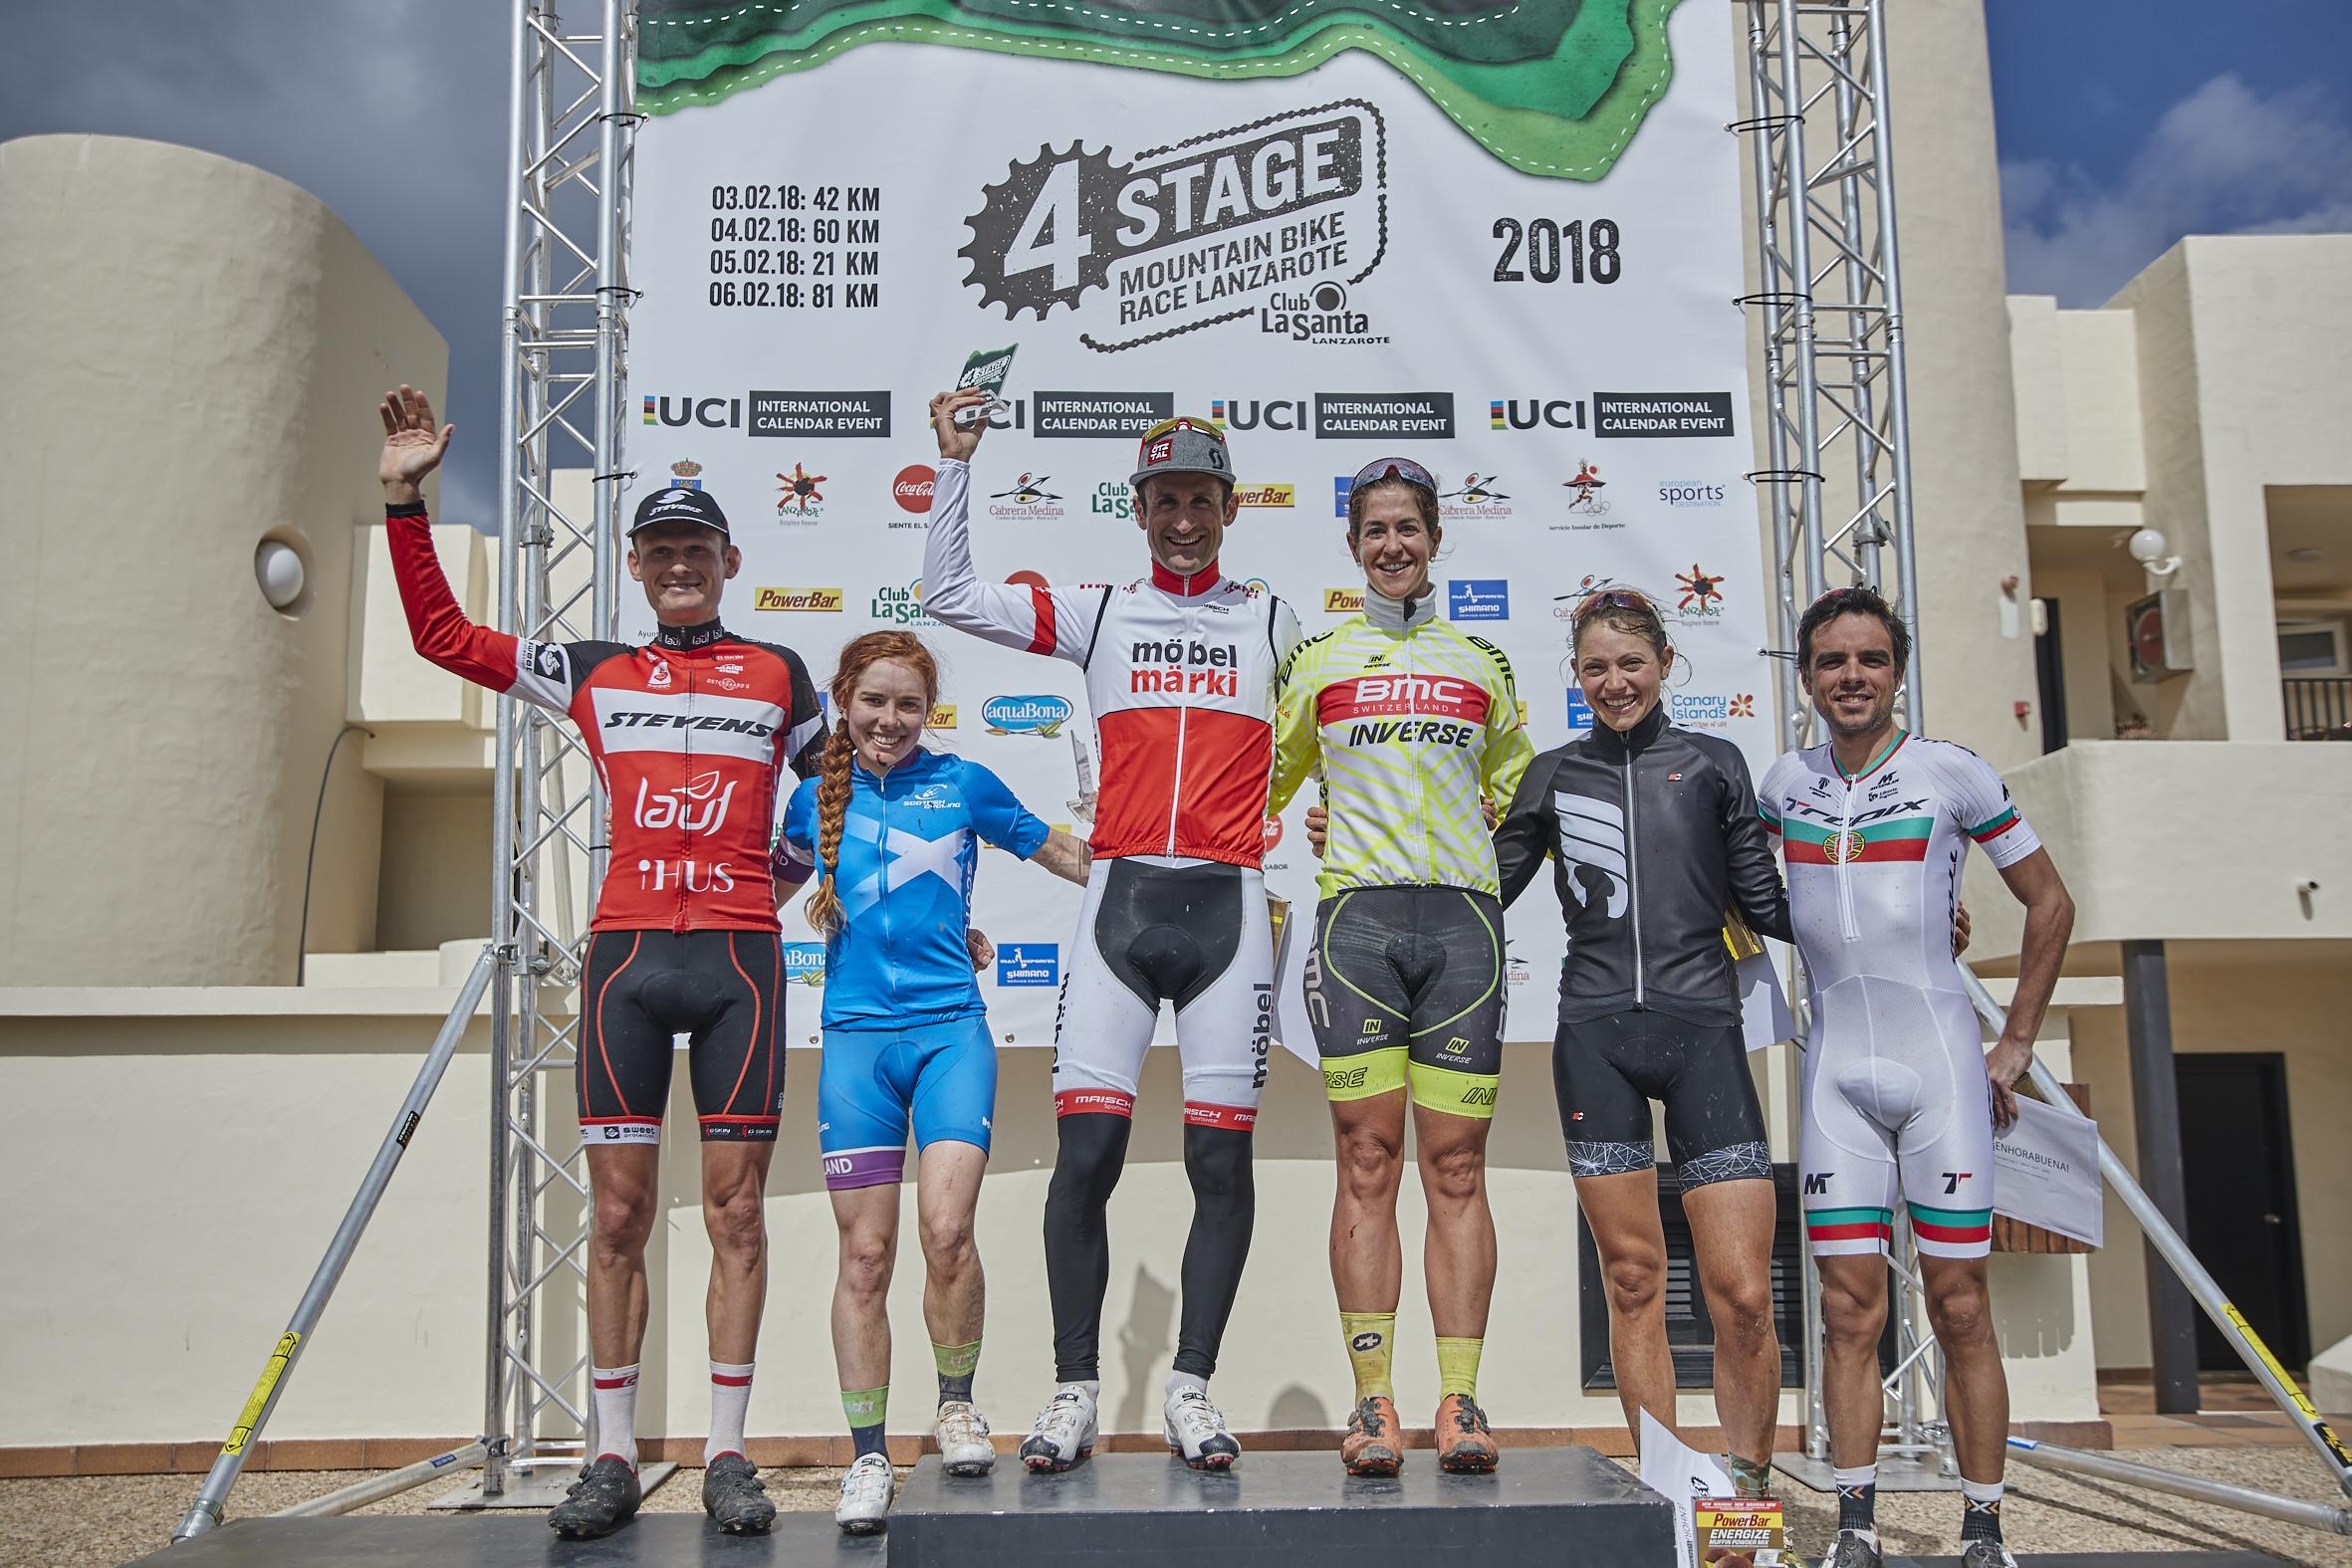 Karl Markt en Mayalen Noriega winnen eerste rit 4Stage MTB Lanzarote